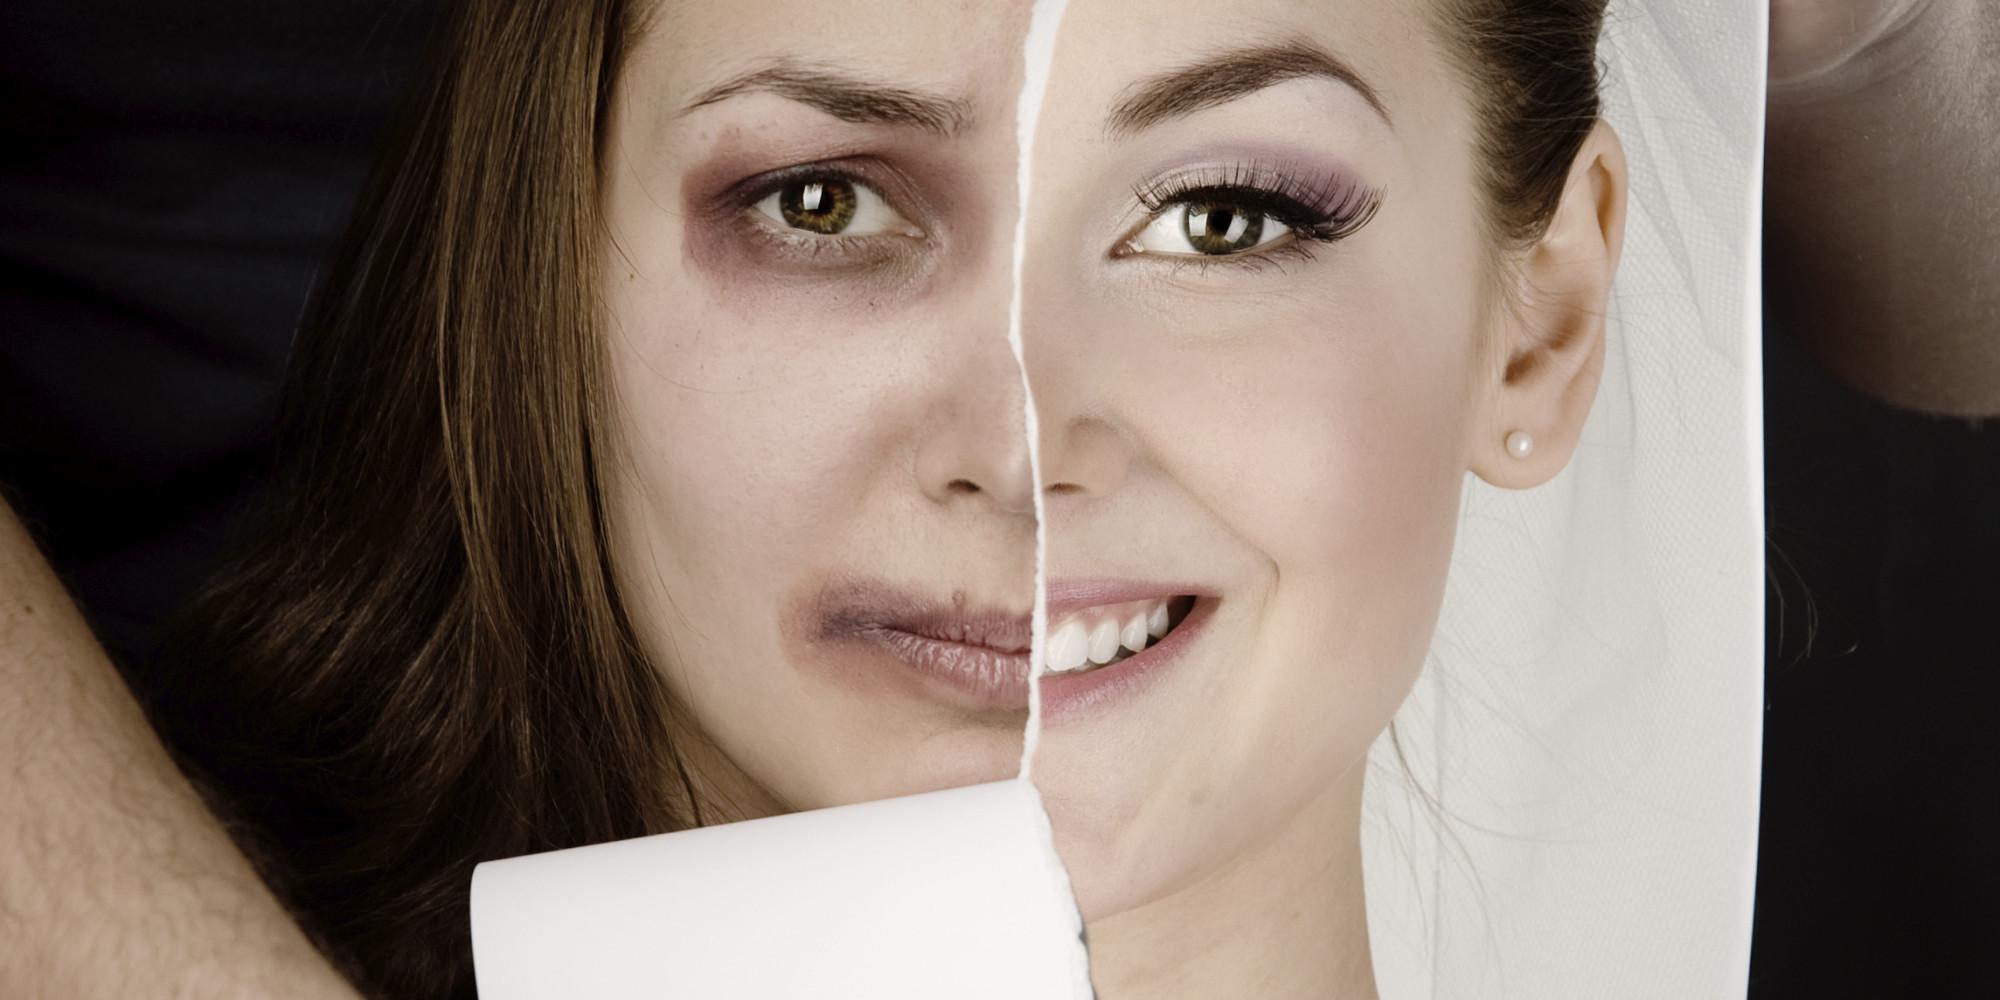 Was ist husliche Gewalt? wwwgewalt-ist-nie-okde